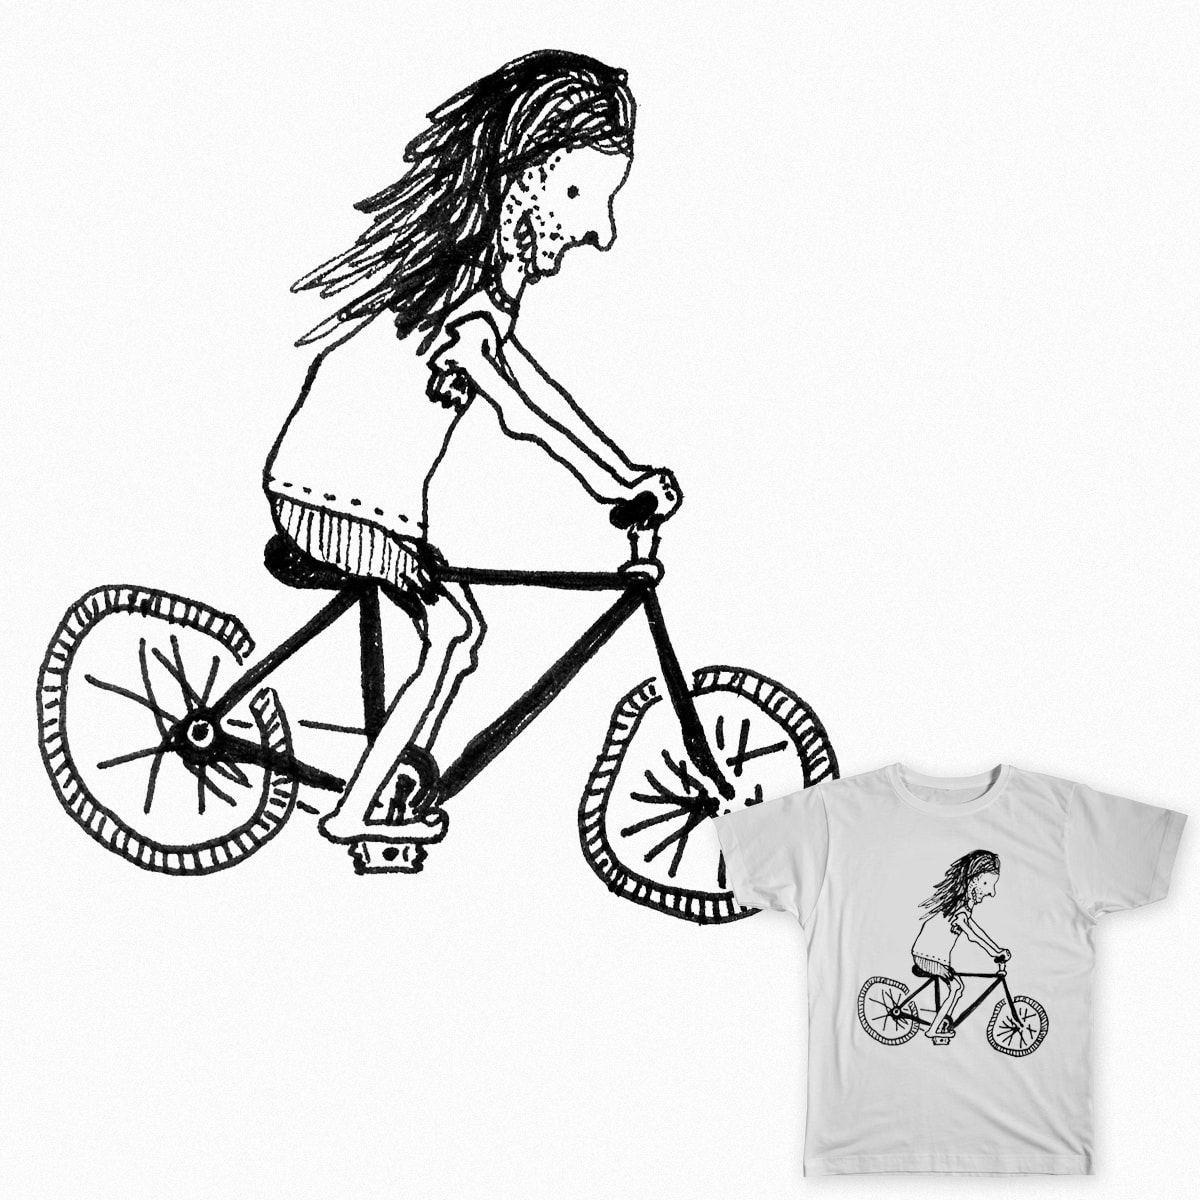 Ride Your Bike by merkinspurlock on Threadless